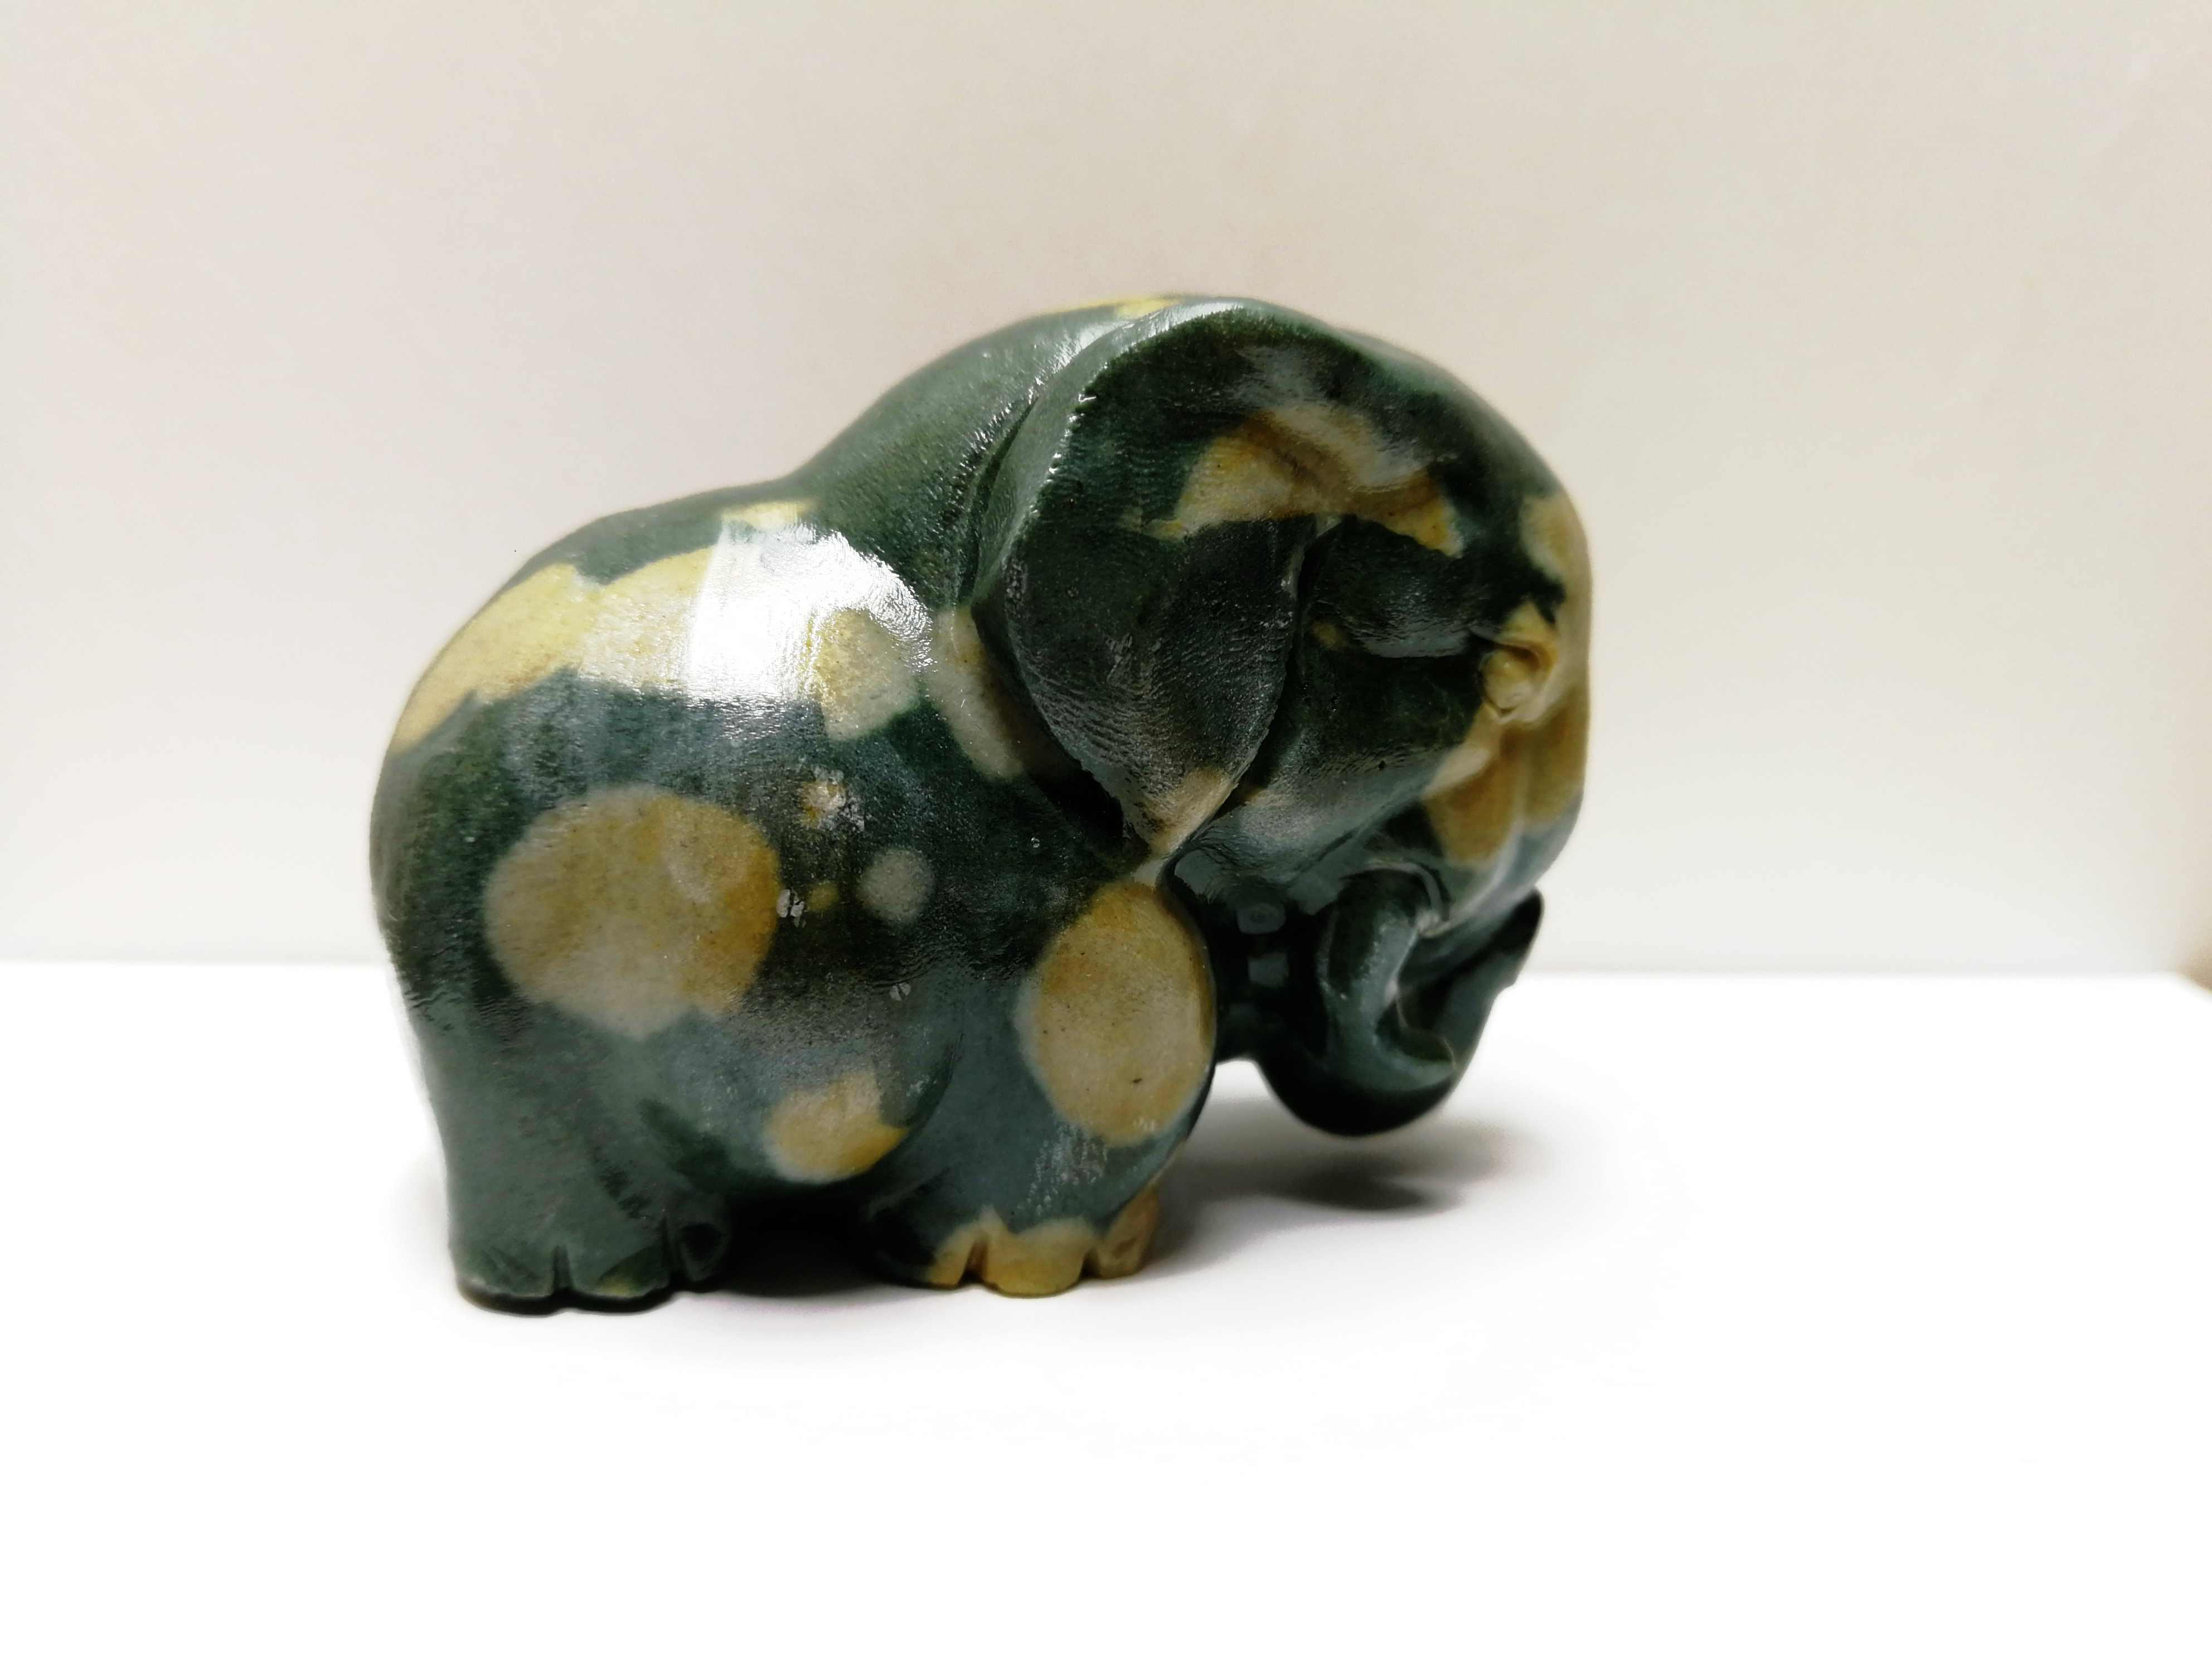 169.8 Gnatural Hijau Opal Kristal Diukir dengan Tangan Gajah Ukiran Sihir Batu Energi